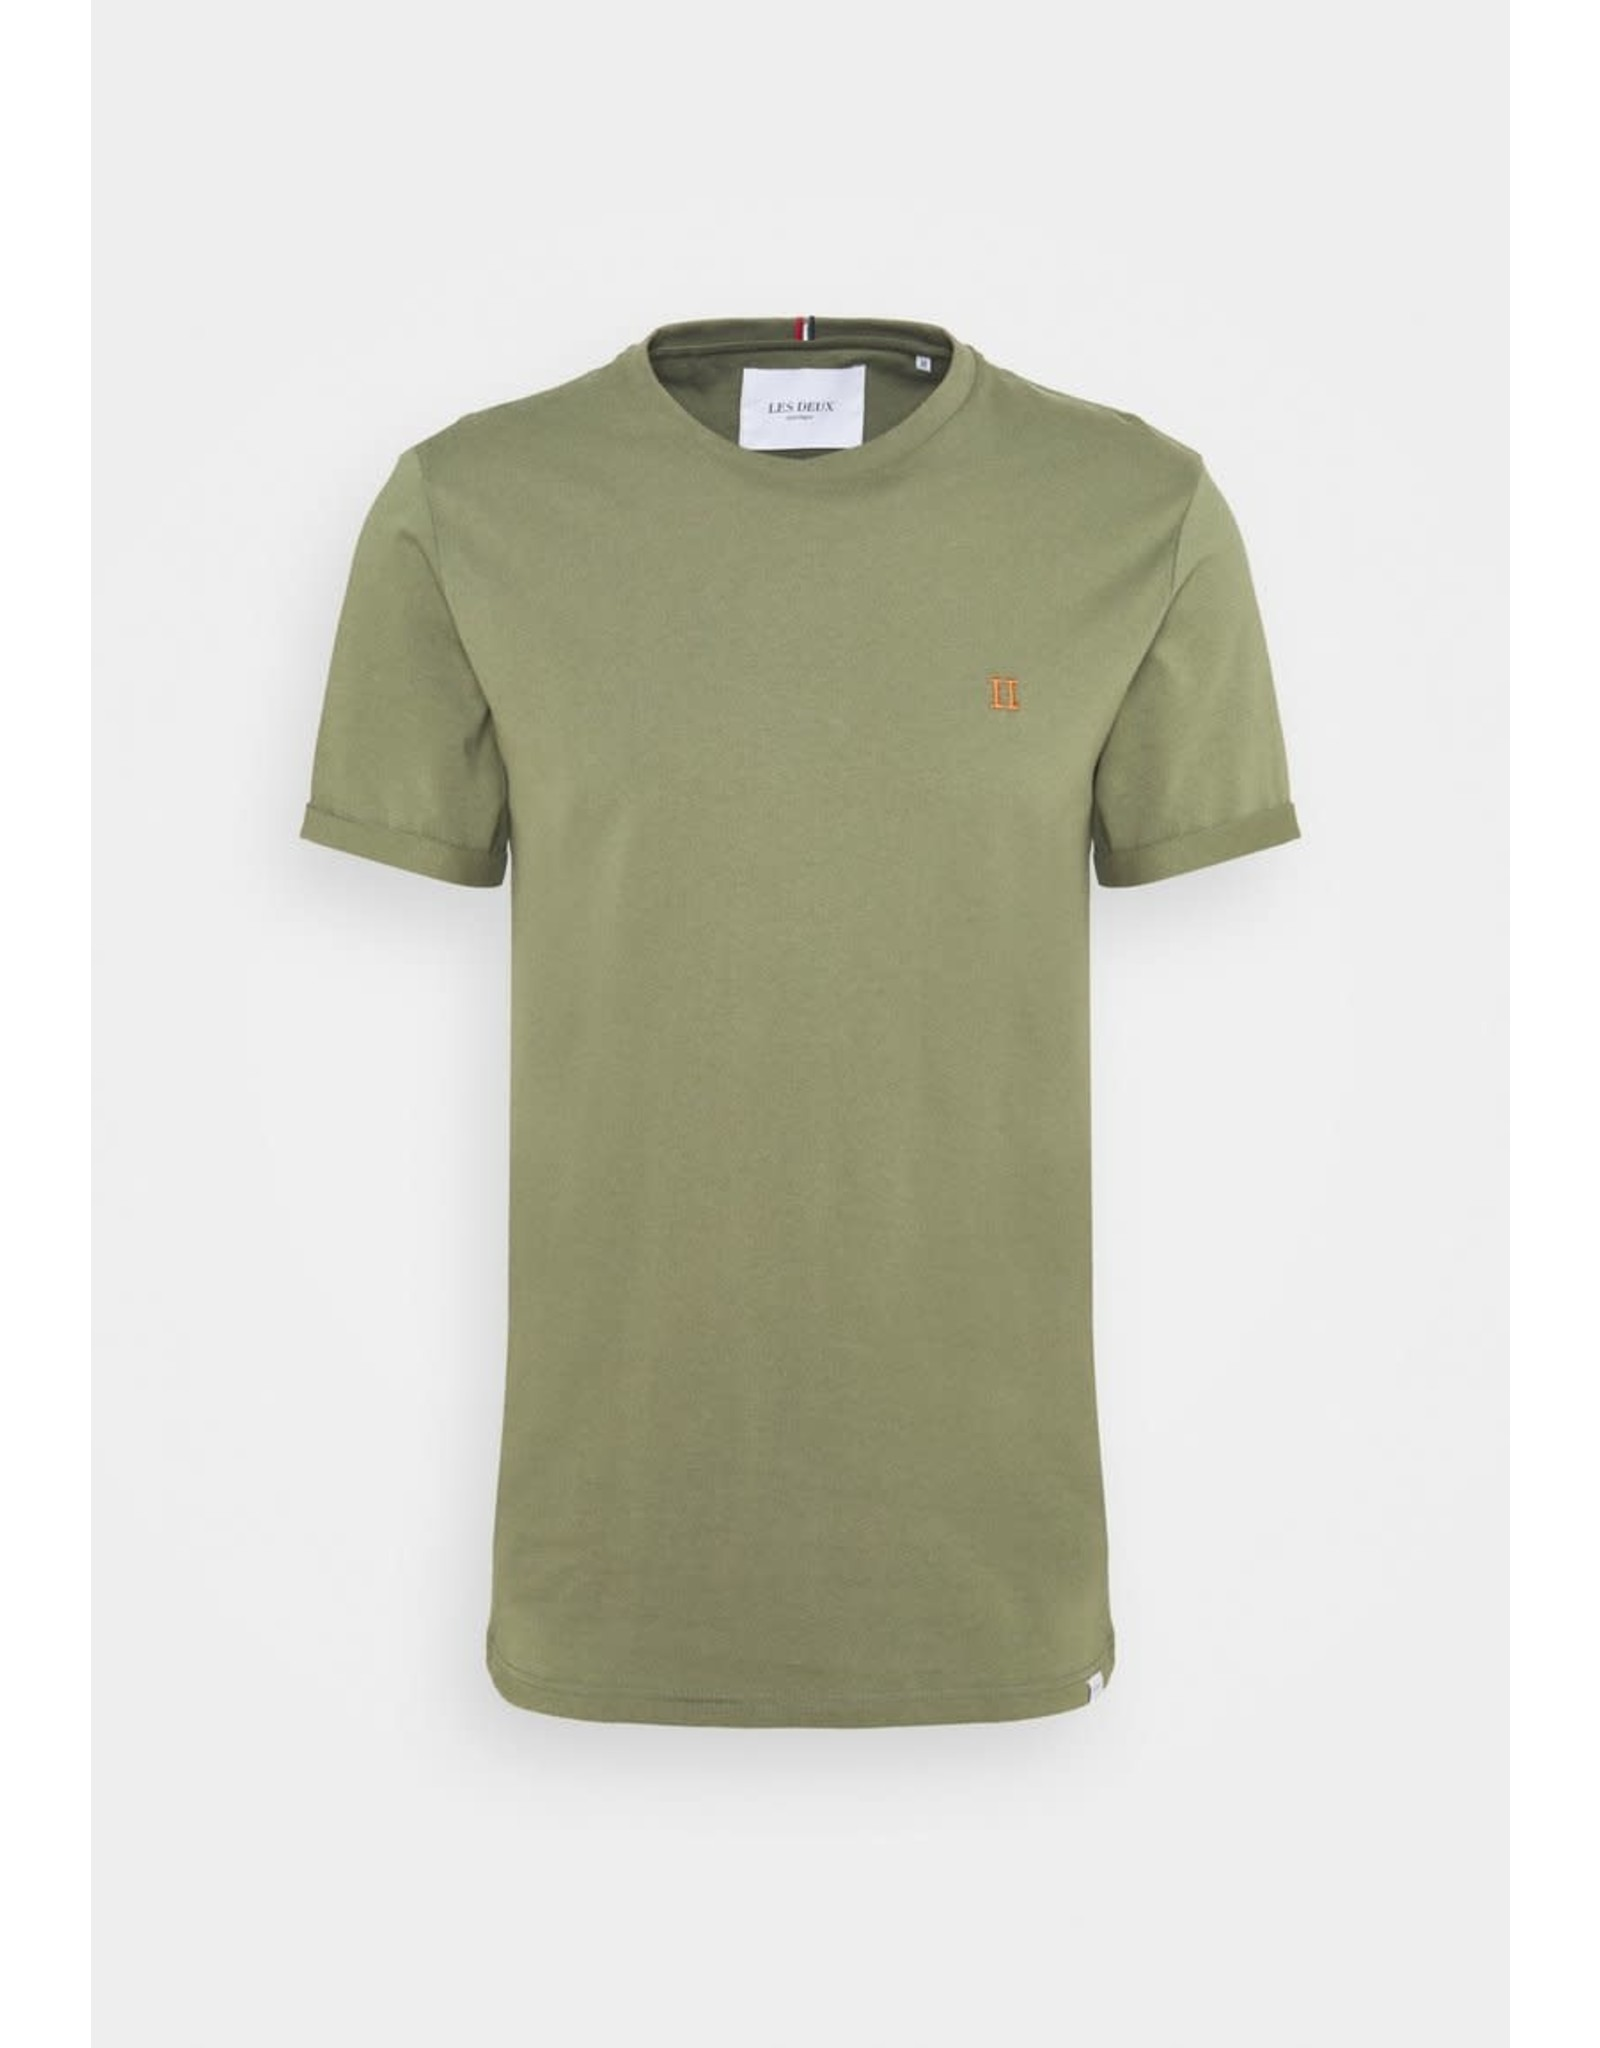 Les Deux Copenhague Nørregaard T-Shirt